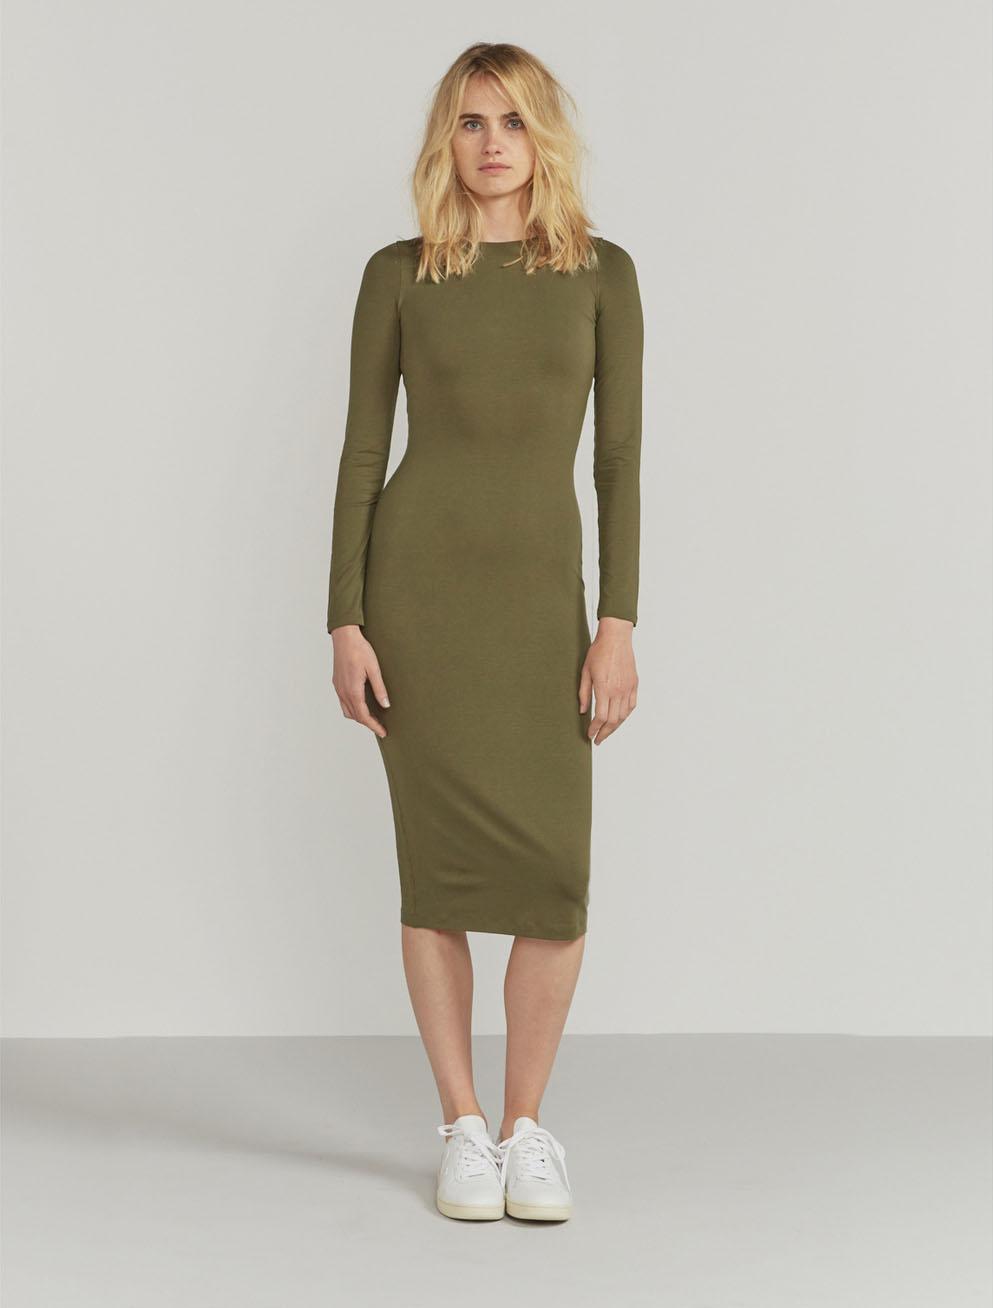 Tencel fitted long-sleeve dress